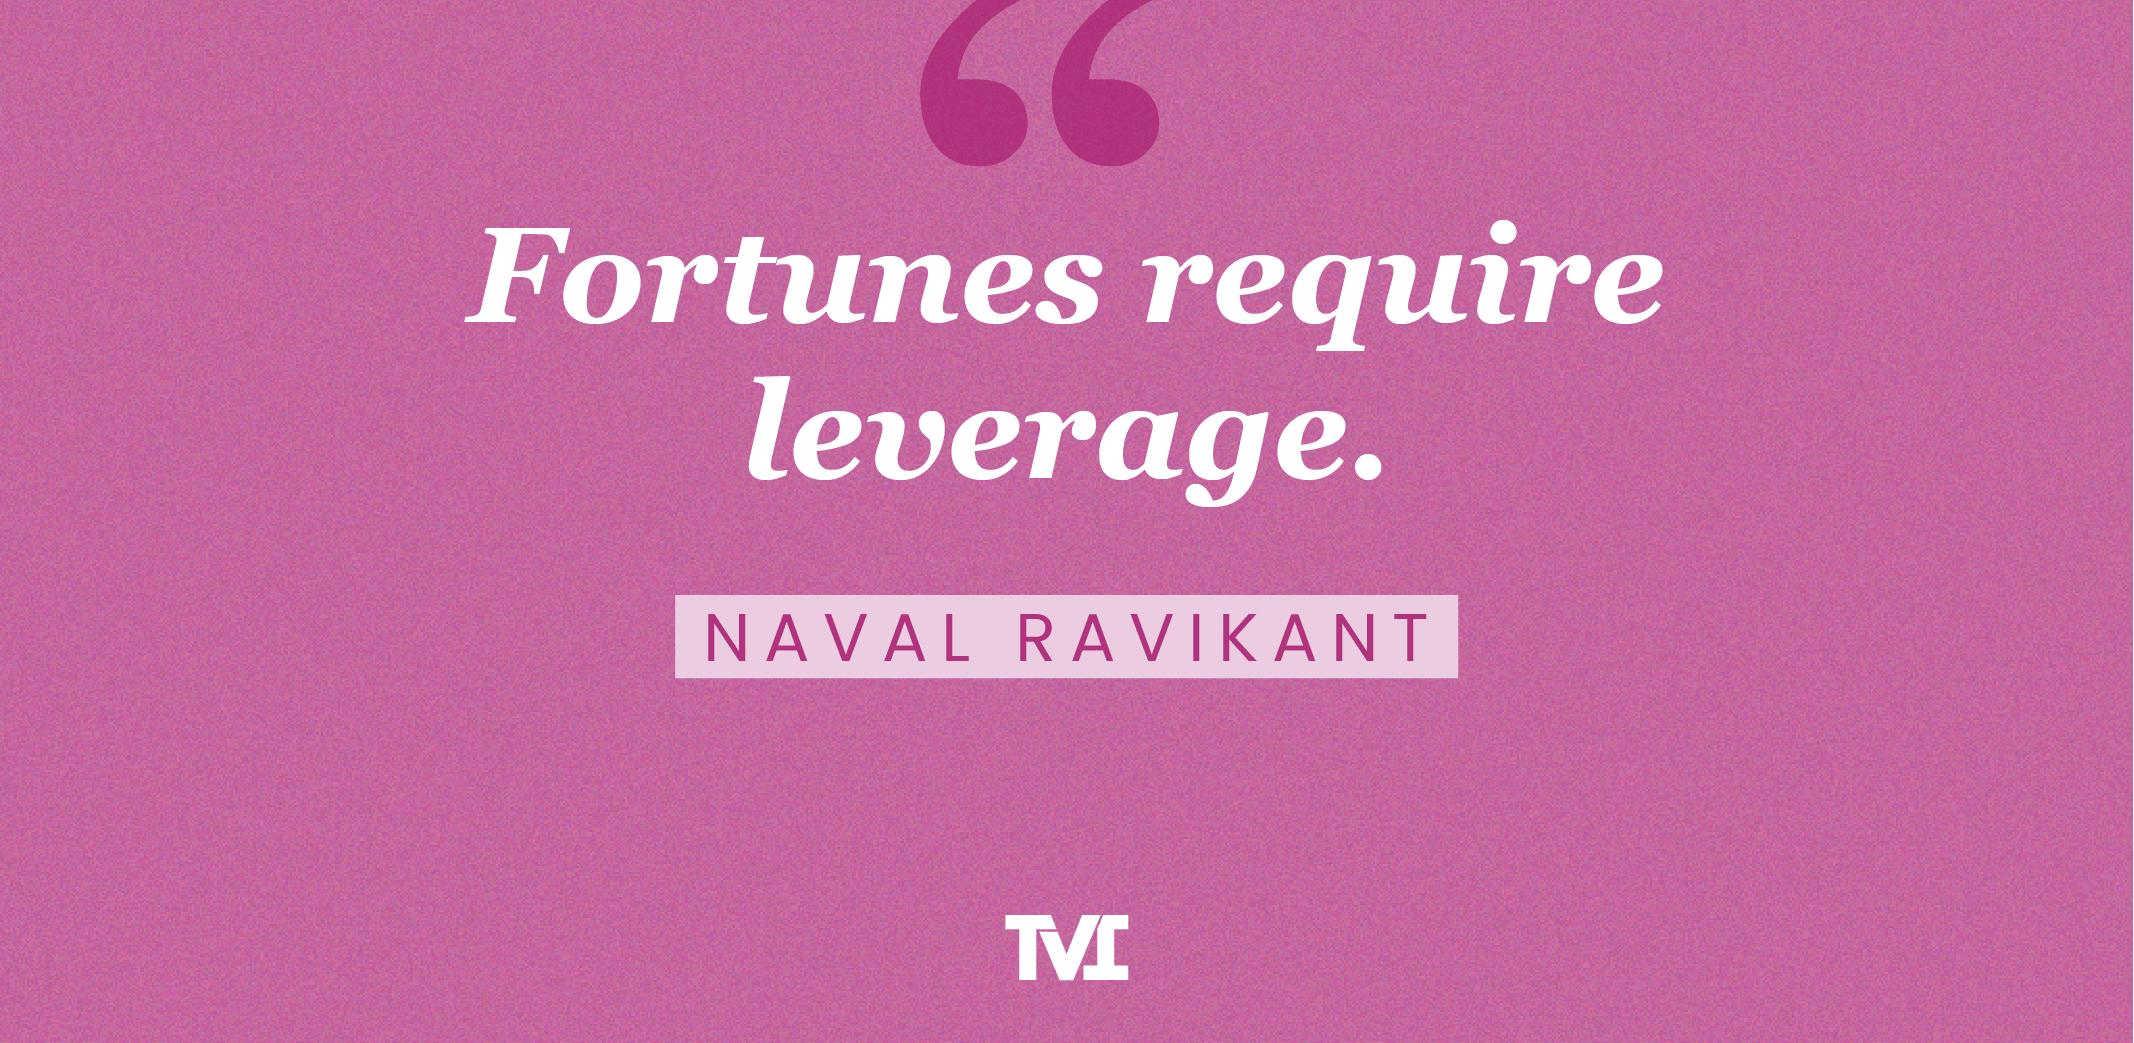 """Fortunes require leverage."" —Naval Ravikant"